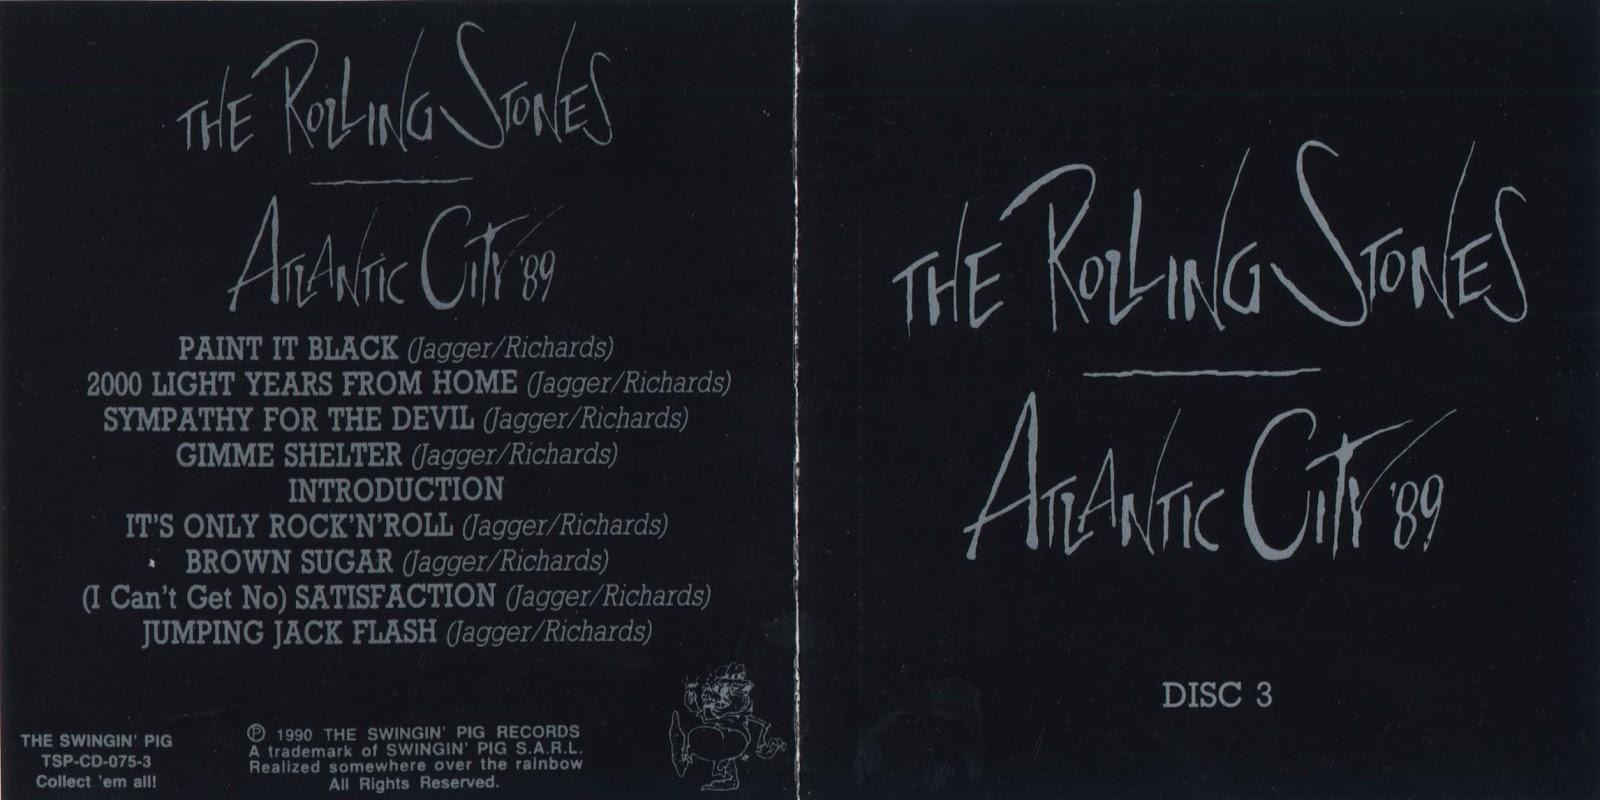 T U B E The Rolling Stones 1989 12 19 Atlantic City